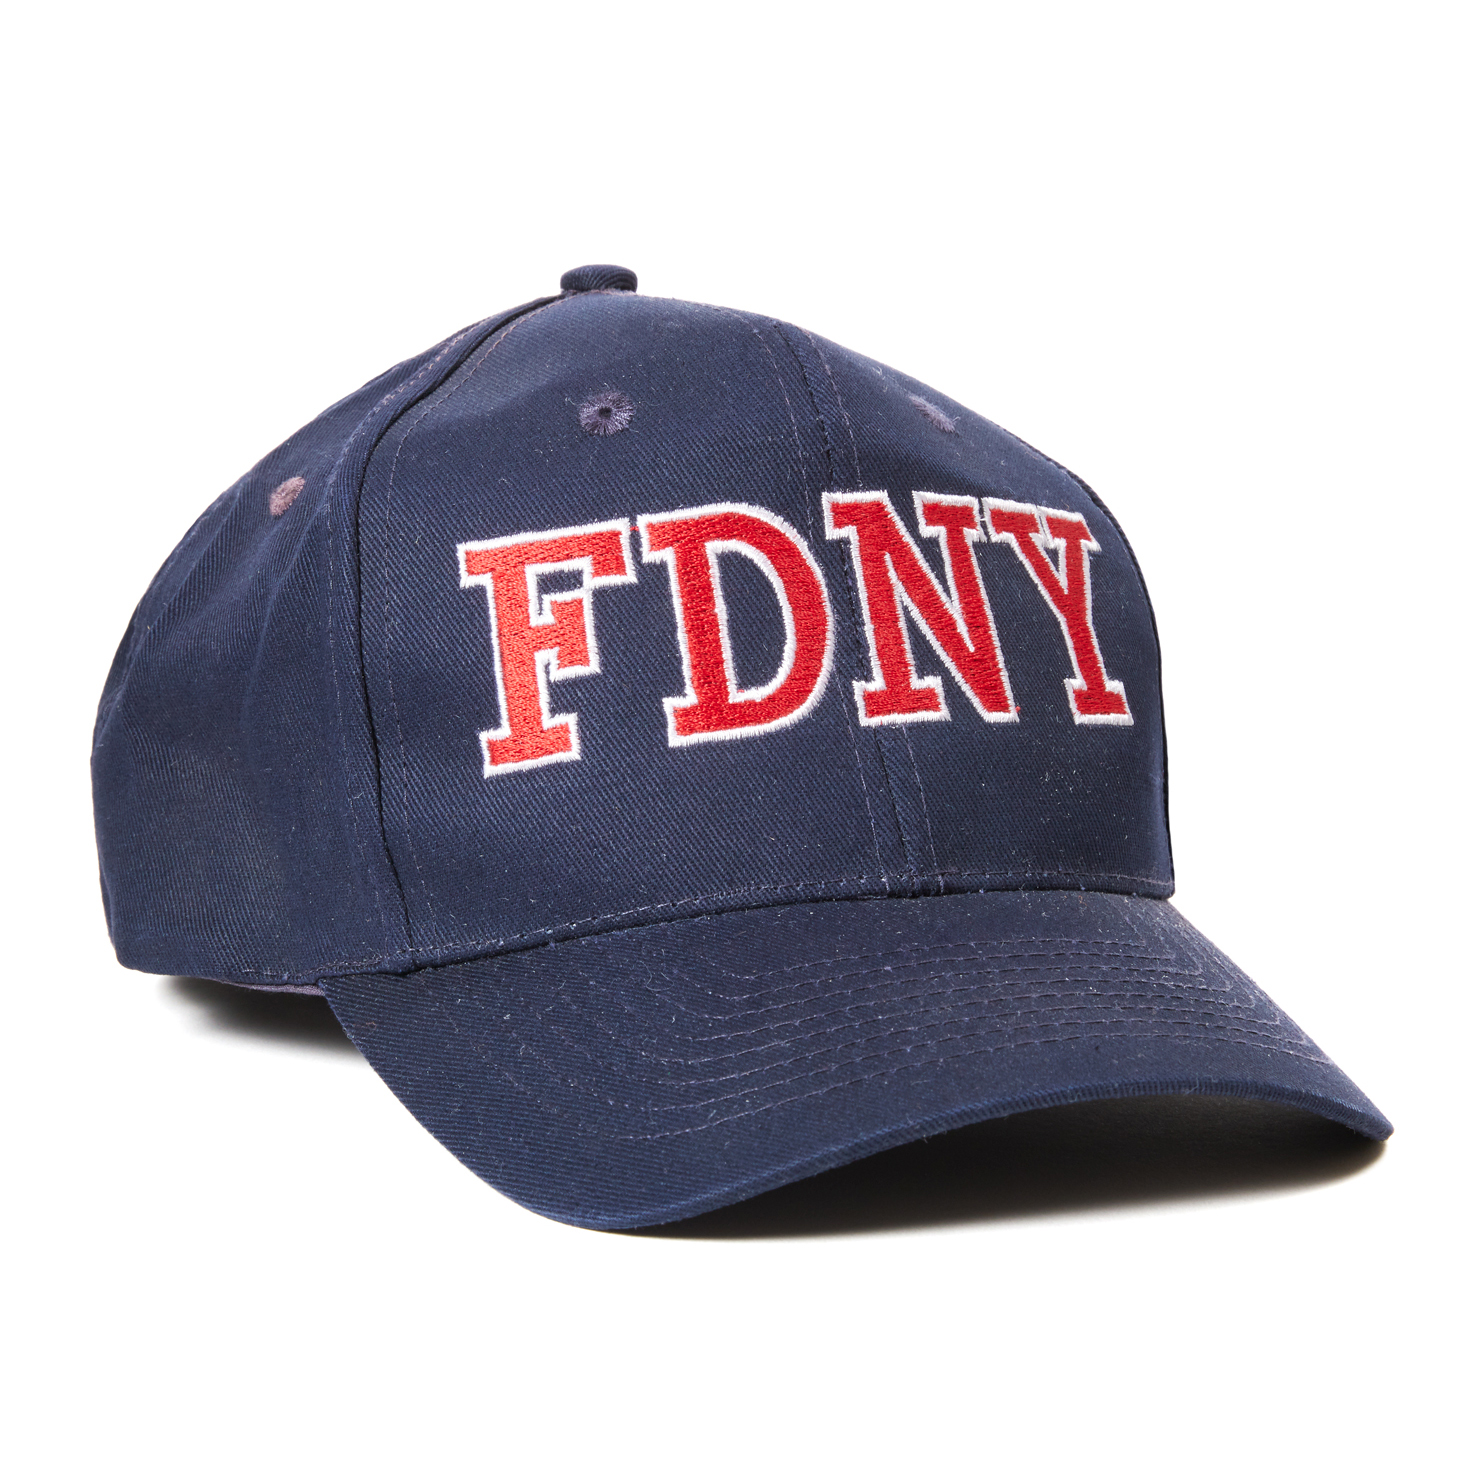 fdny-hat